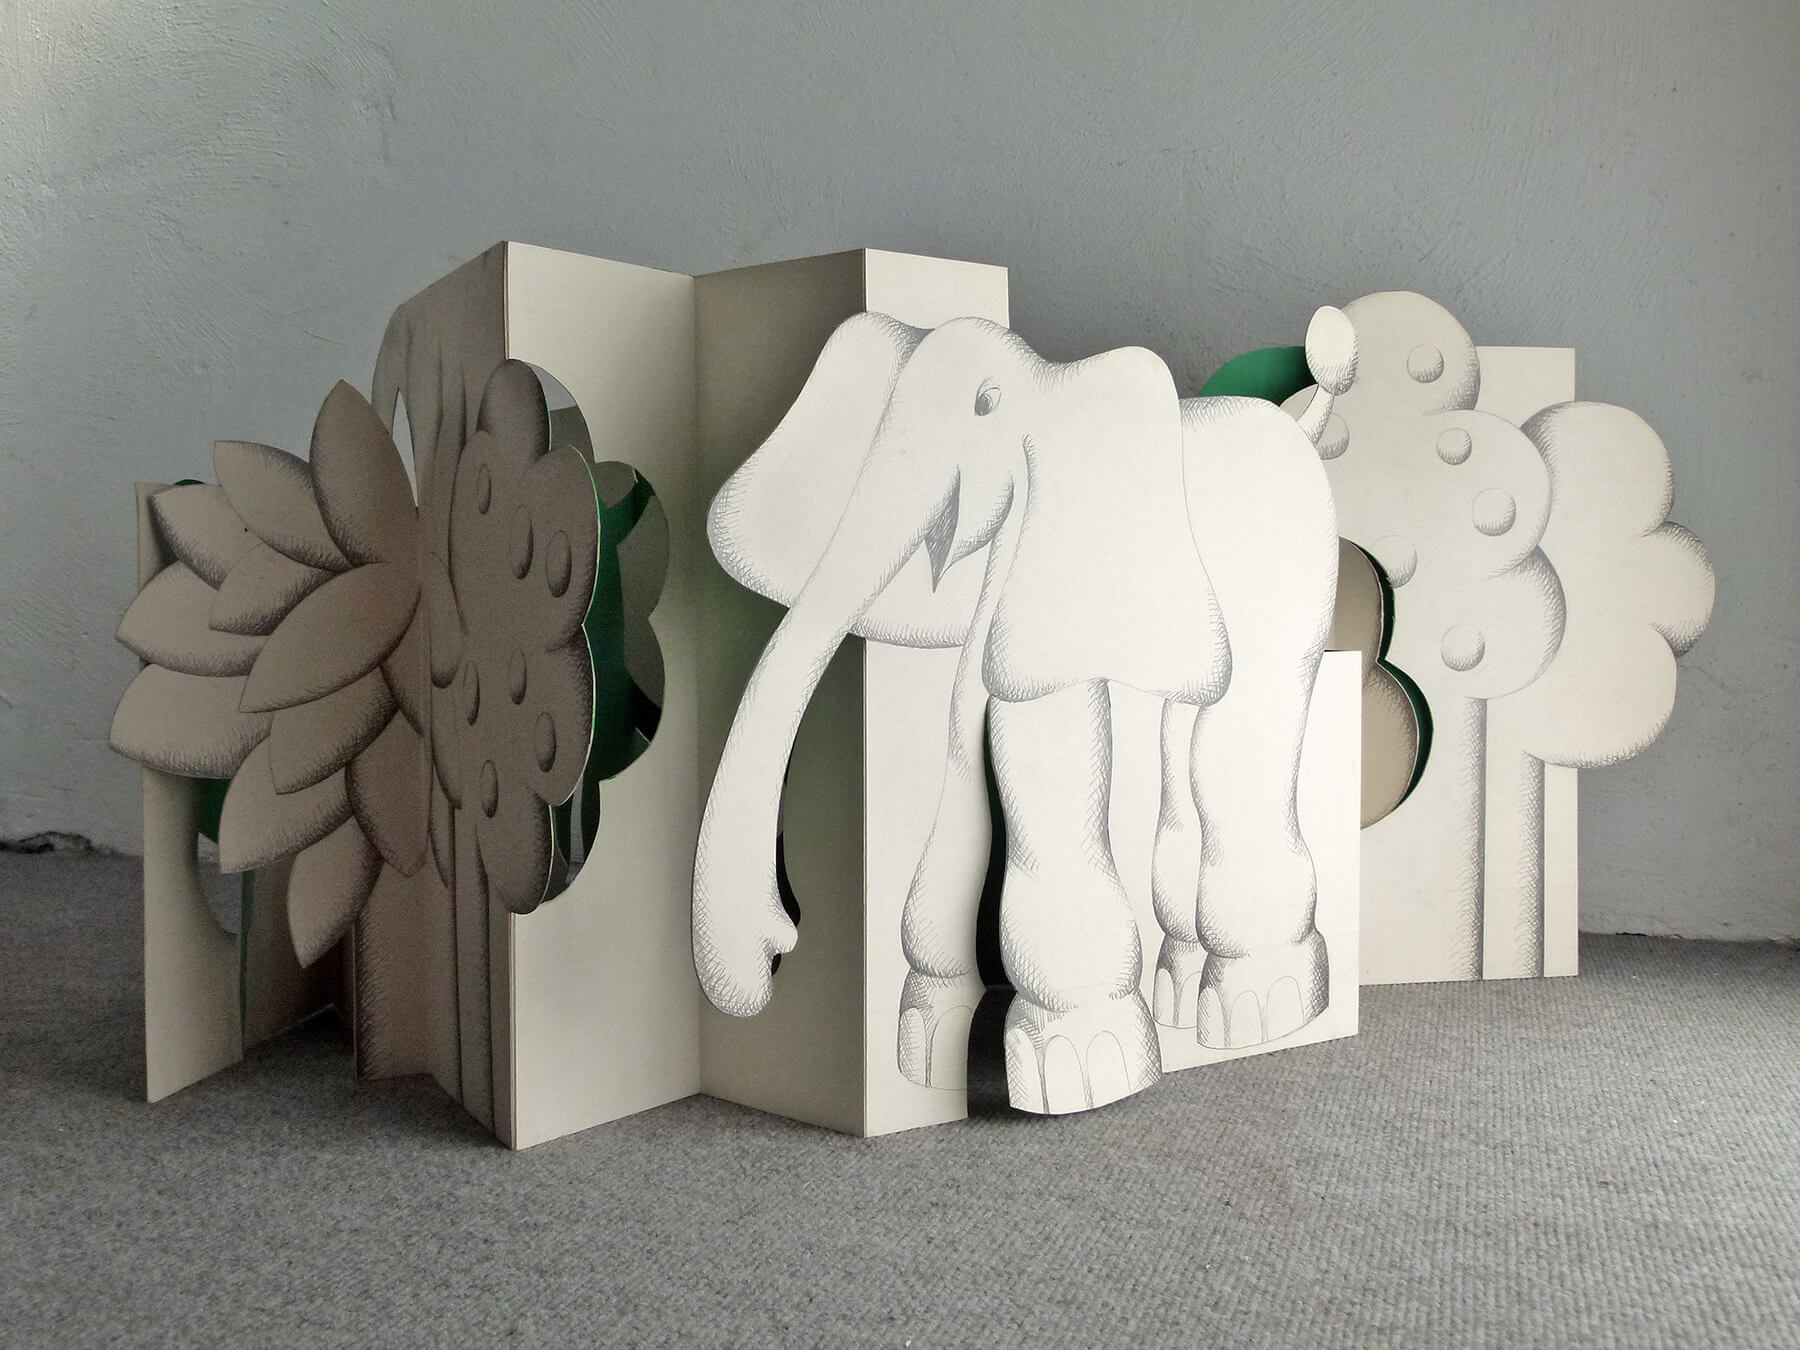 Barbara Jäger Elefantenleporello Kunstakademie Karlsruhe 1969